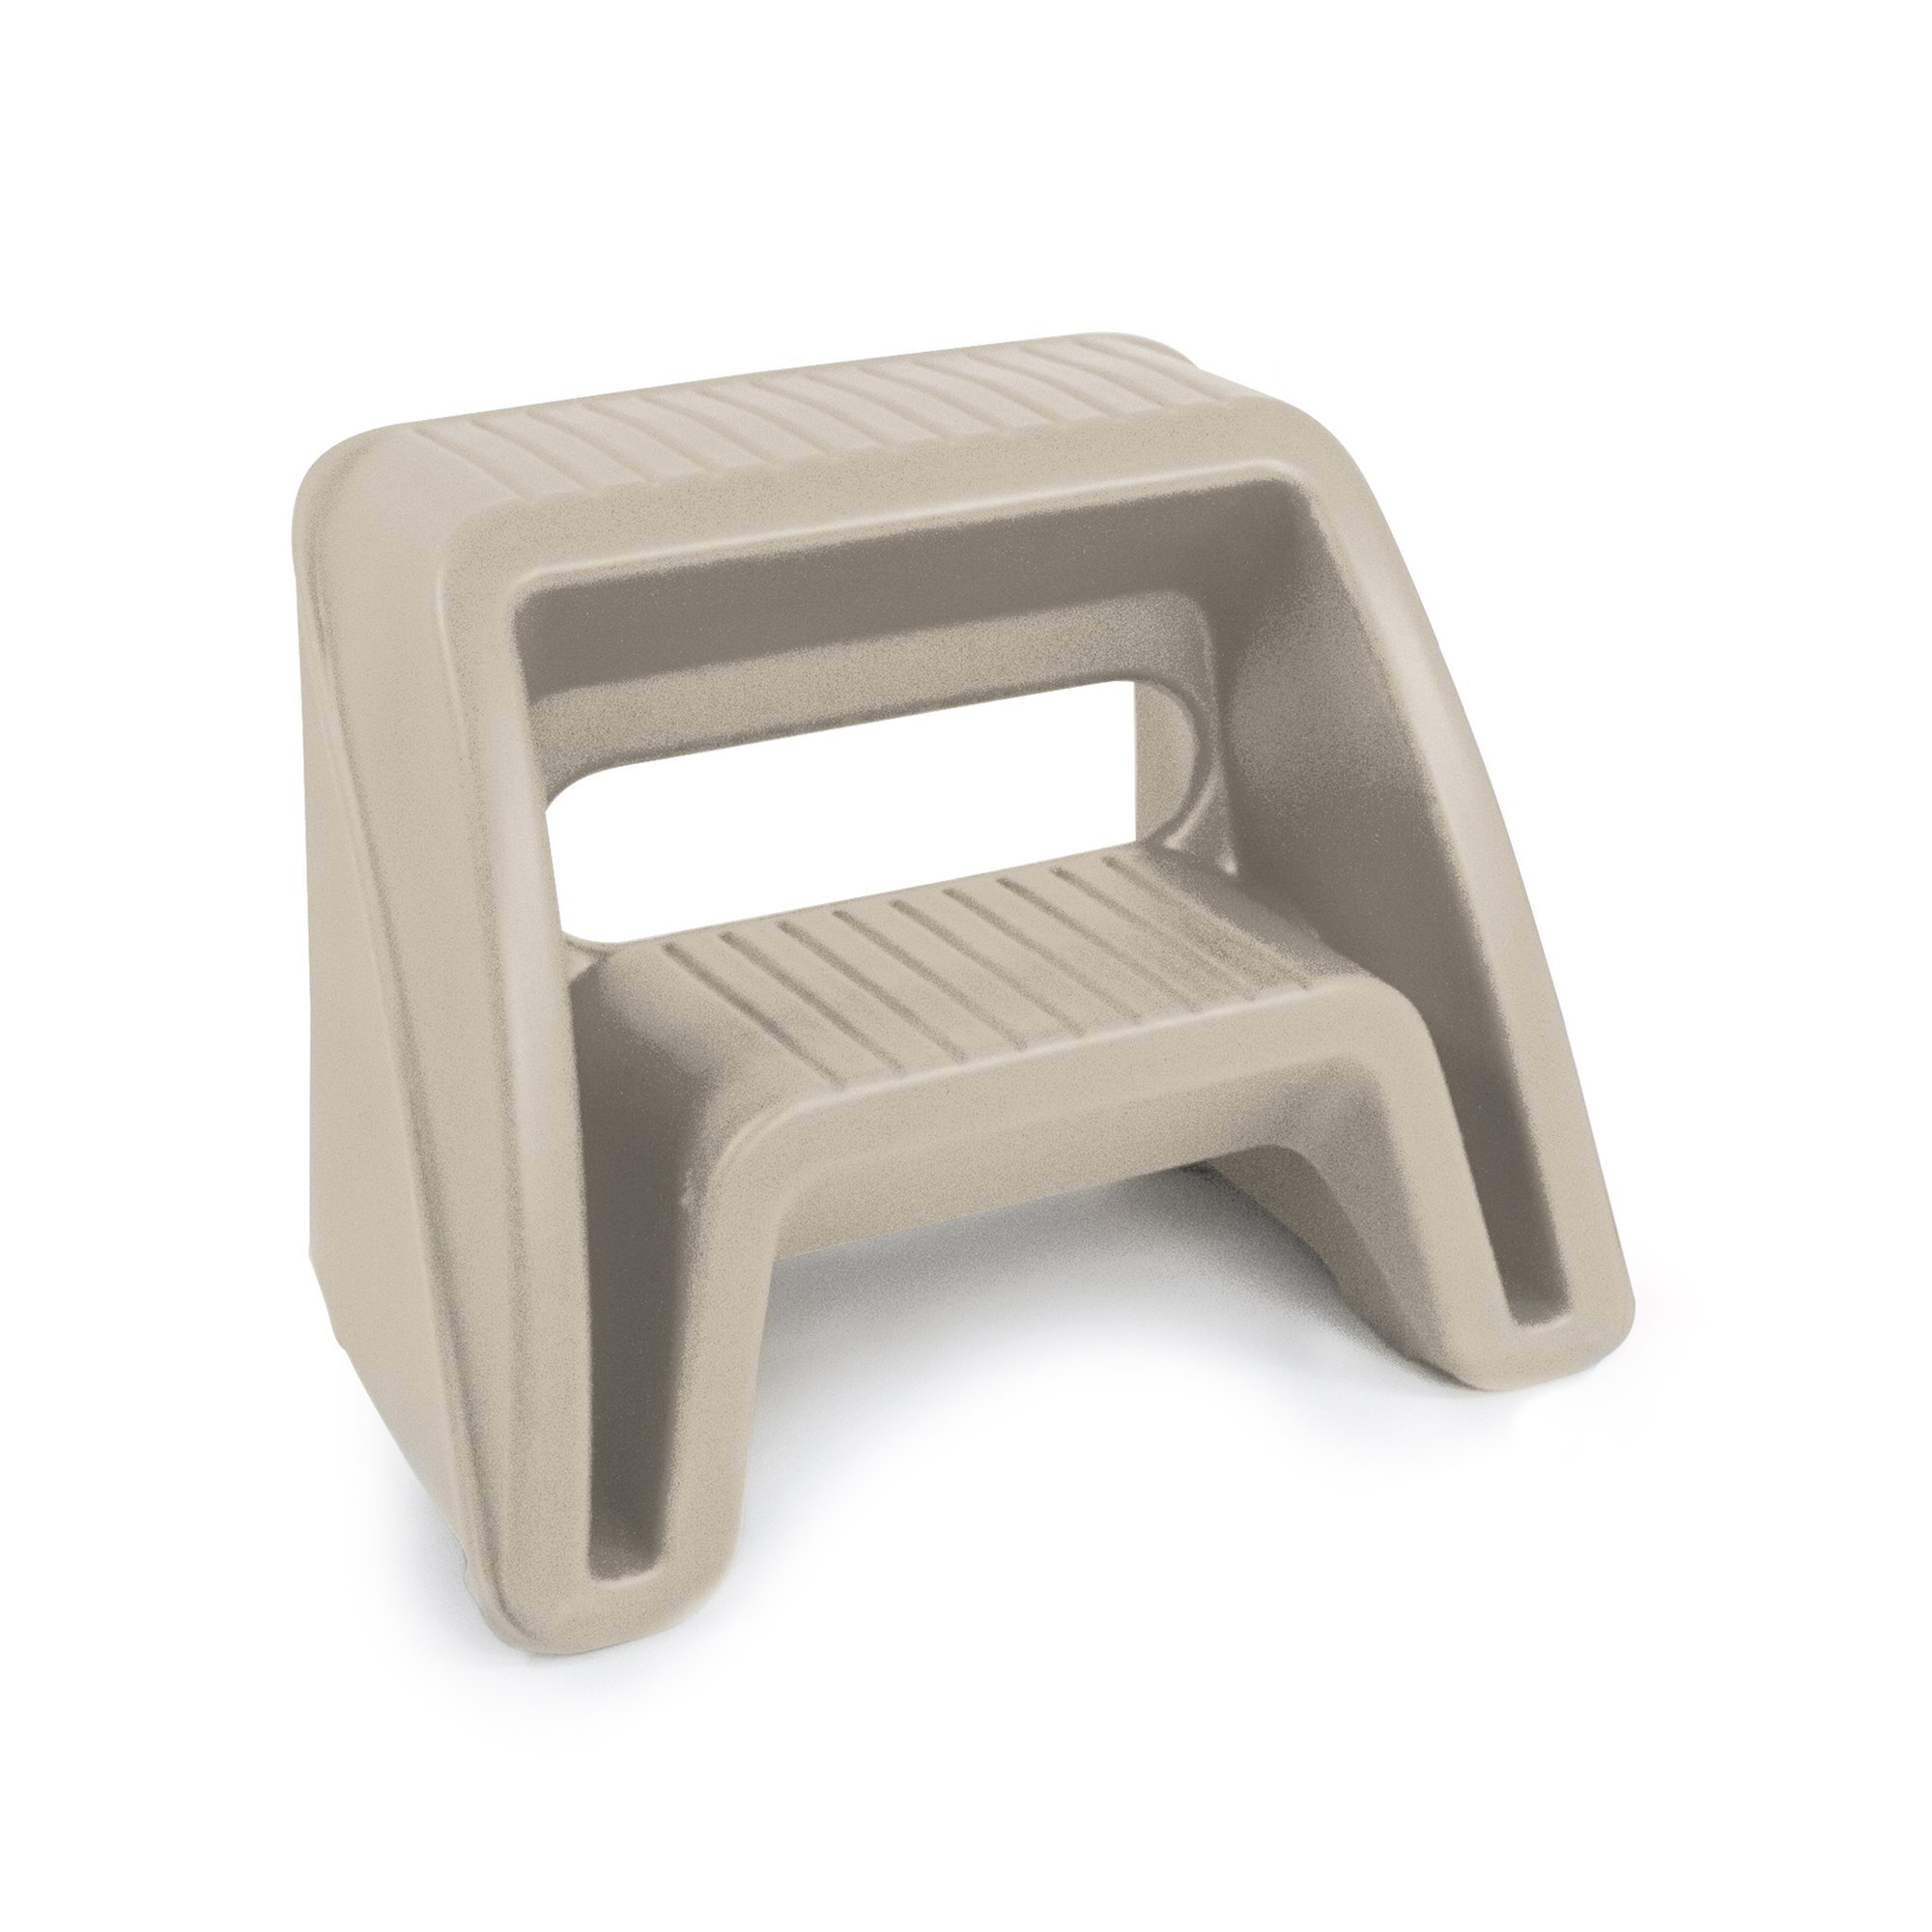 Simplay3 Handy Home 2 Step Plastic Stool, 16'' Top Step